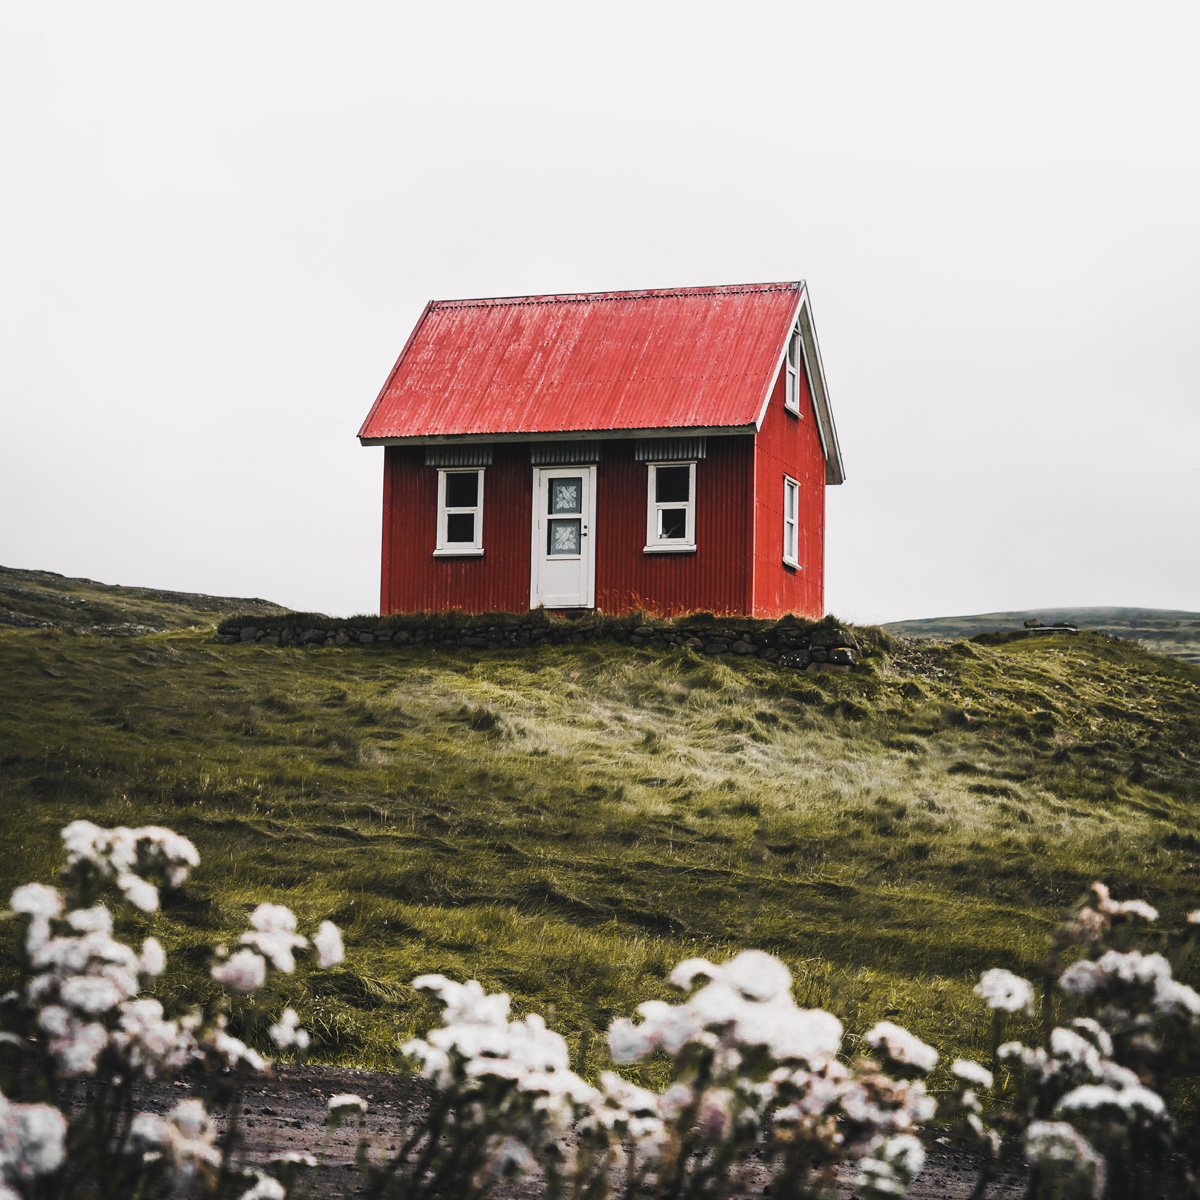 Island © Luke Stackpoole | unsplash